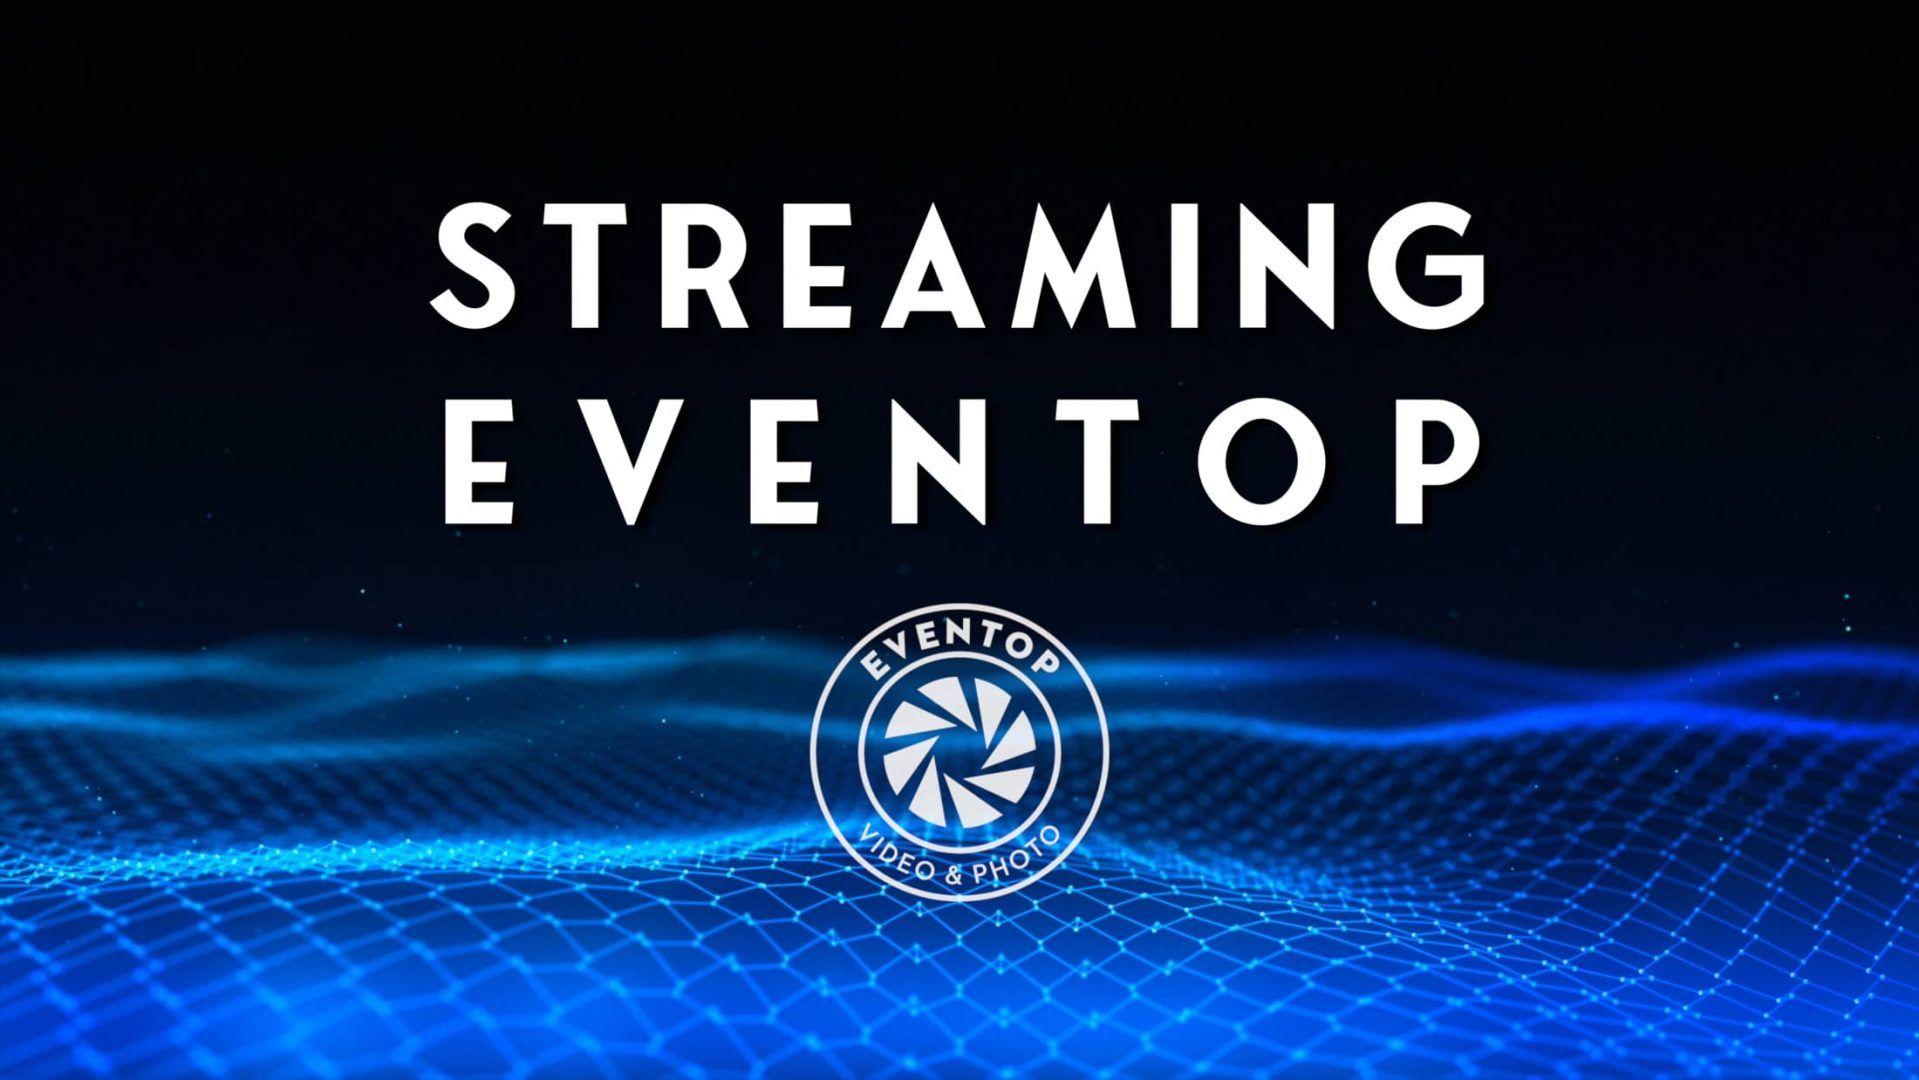 servicios de streaming para eventos en Madrid eventop